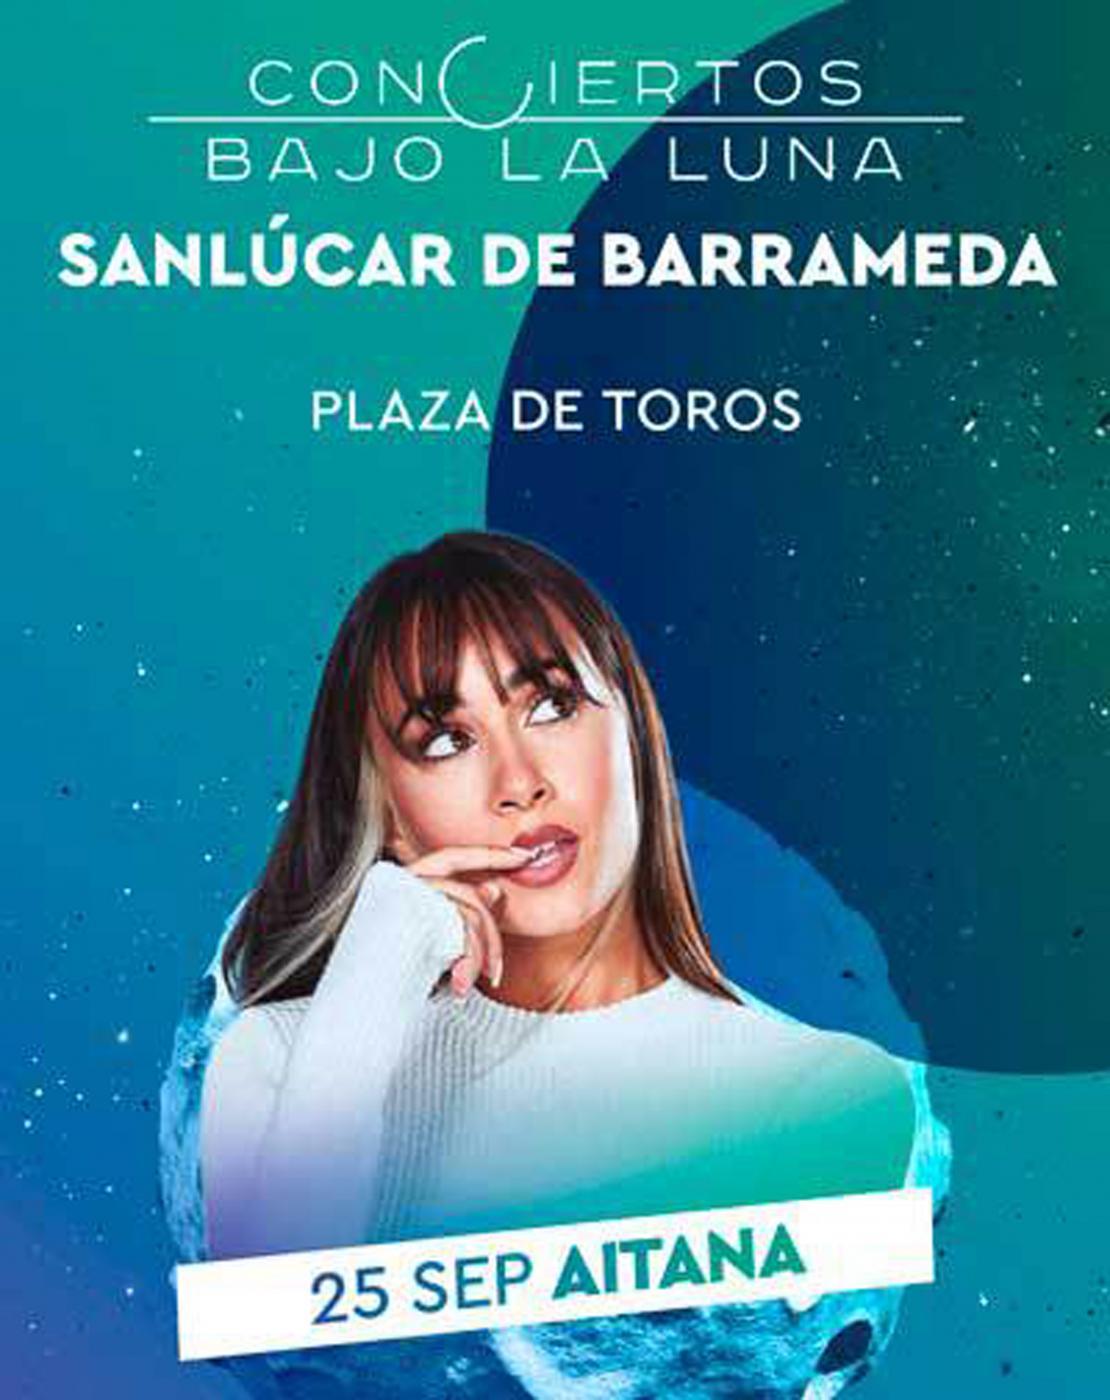 ¿Sin plan para este fin de semana? Aitana aterriza en la Plaza de Toros de Sanlúcar